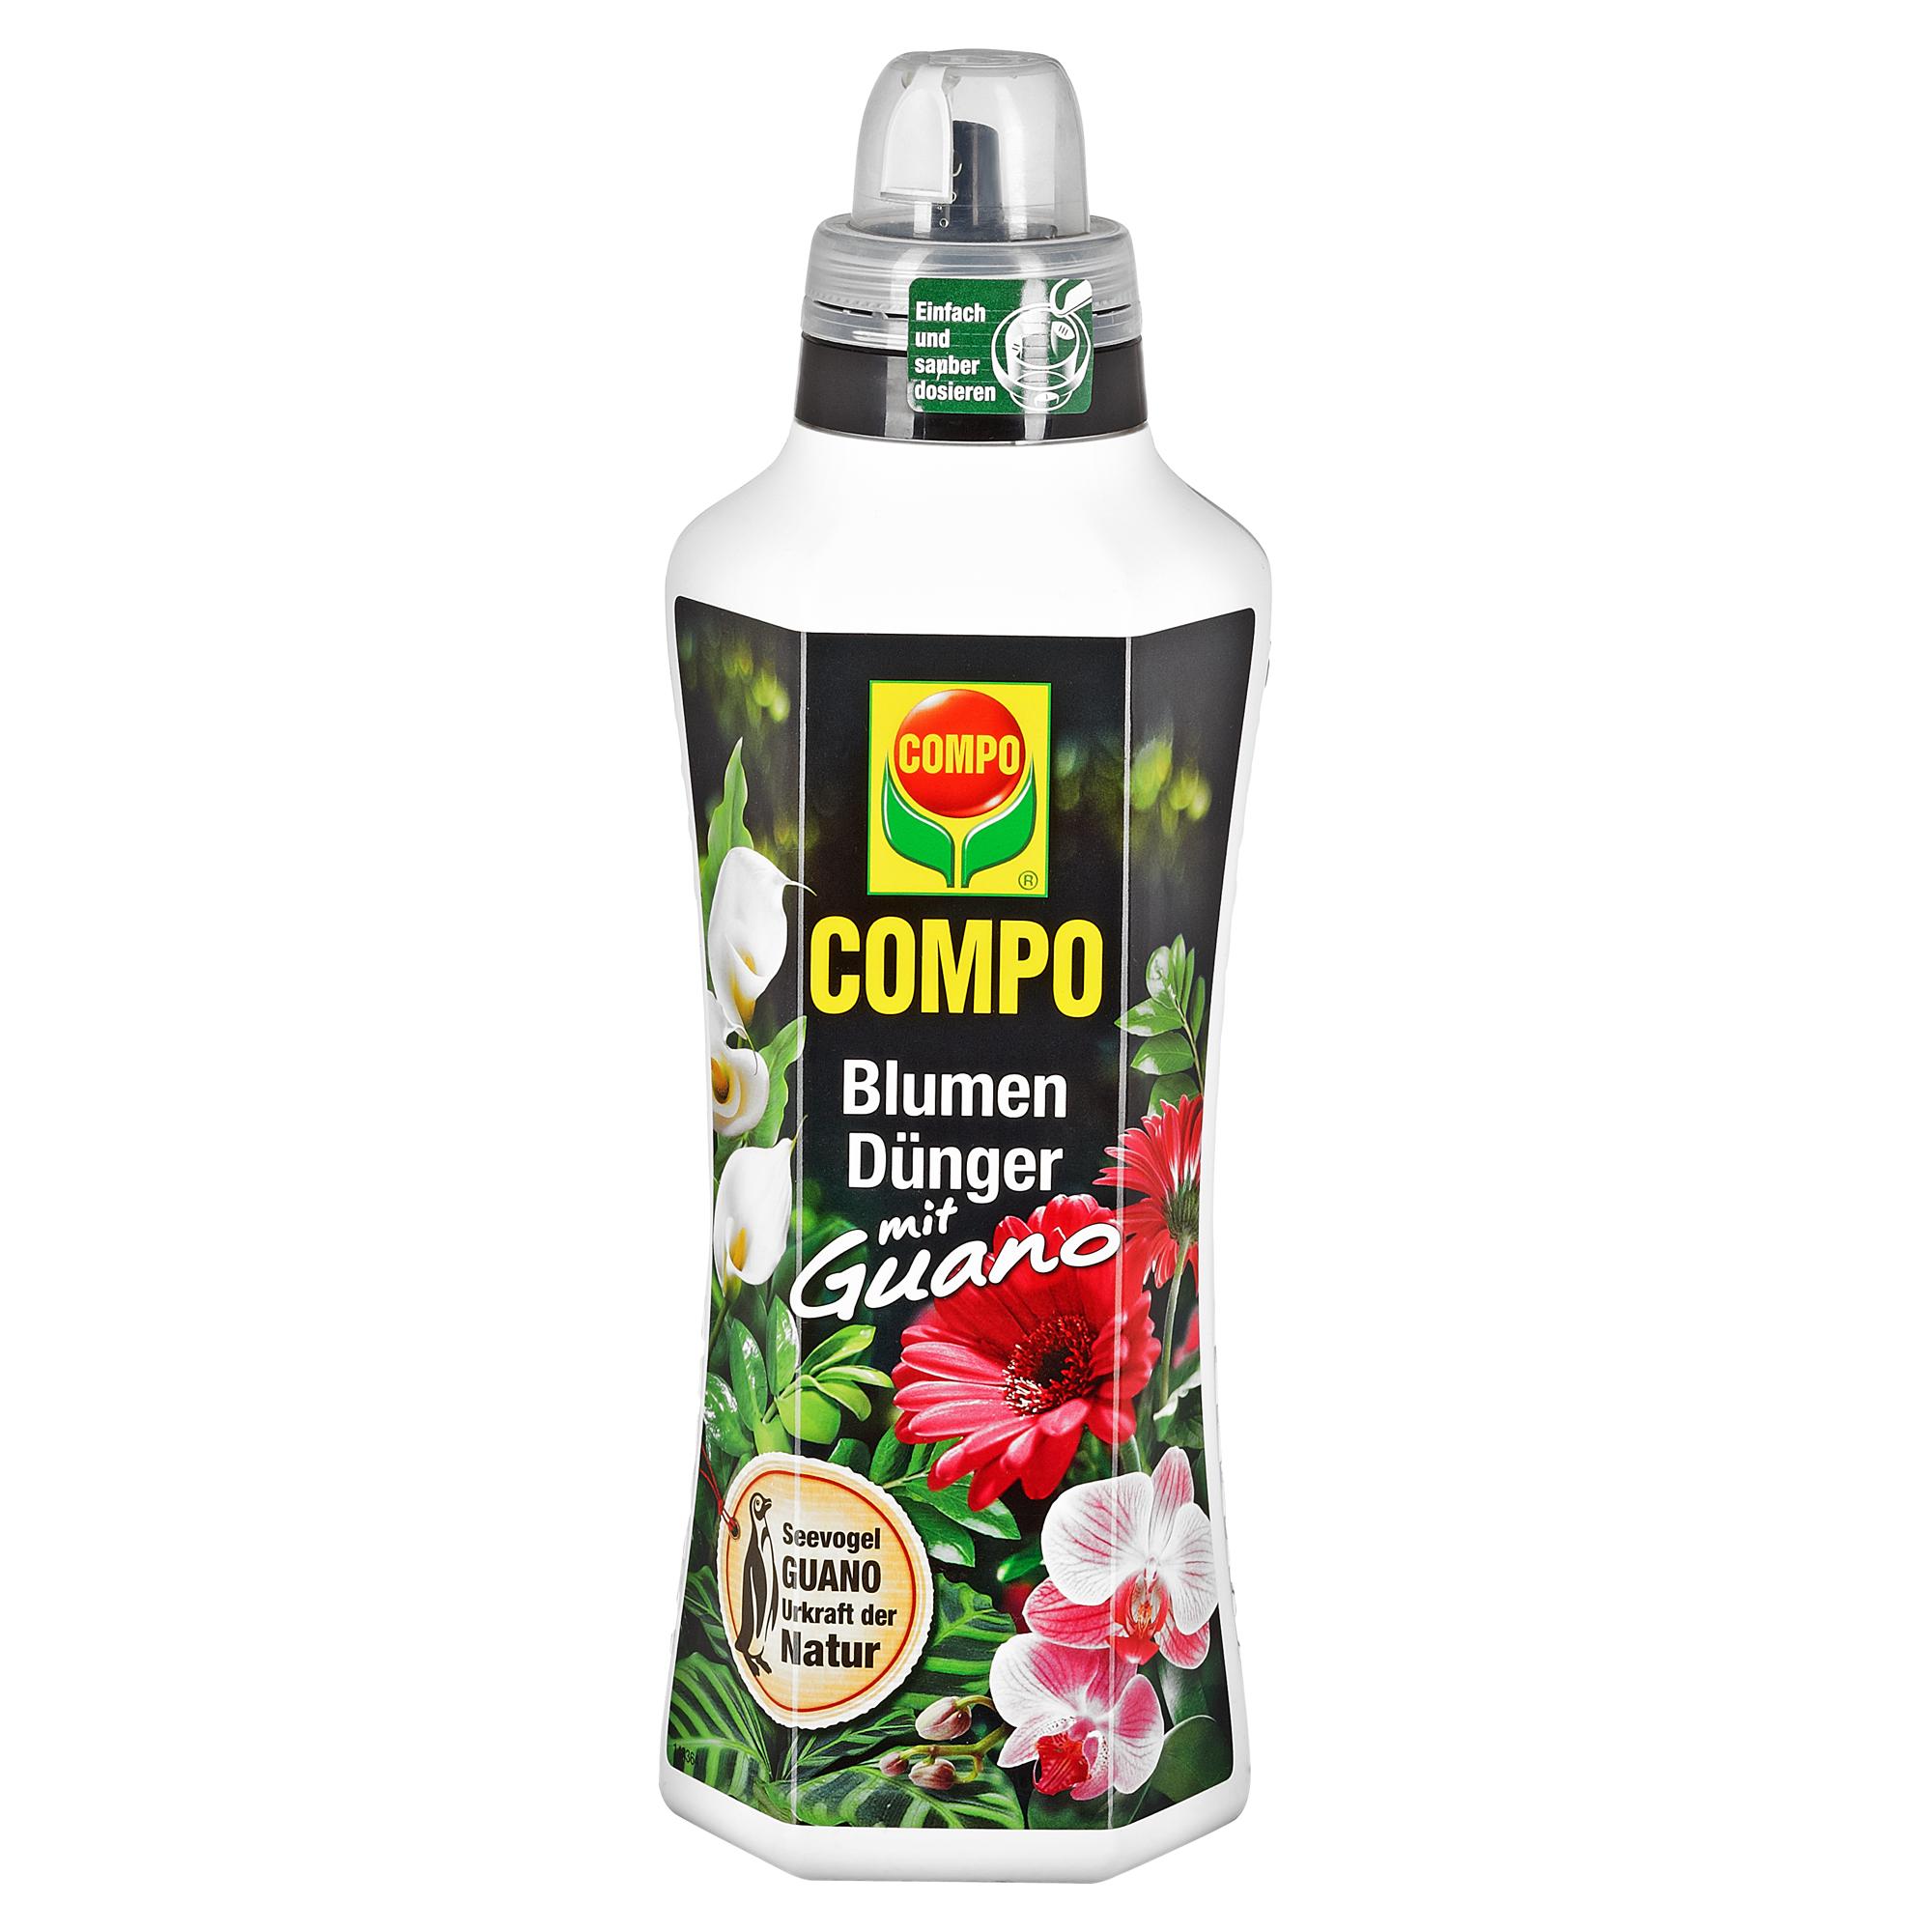 Compo Blumendünger mit Guano 1 l